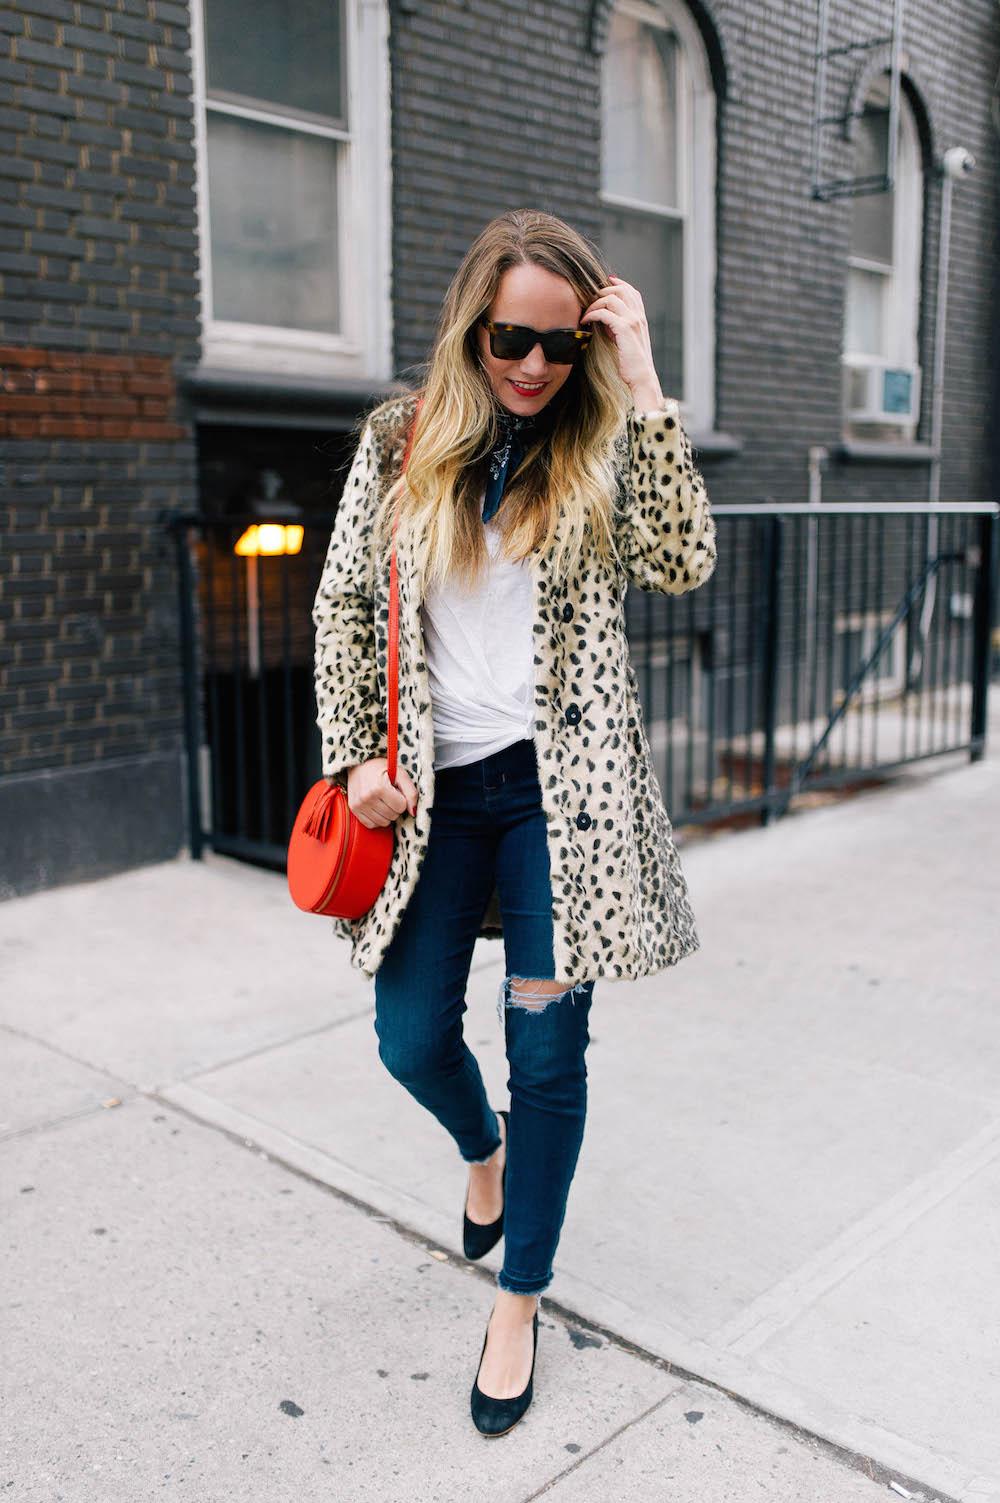 j.mclaughlin pella leopard coat | grace atwood, the stripe